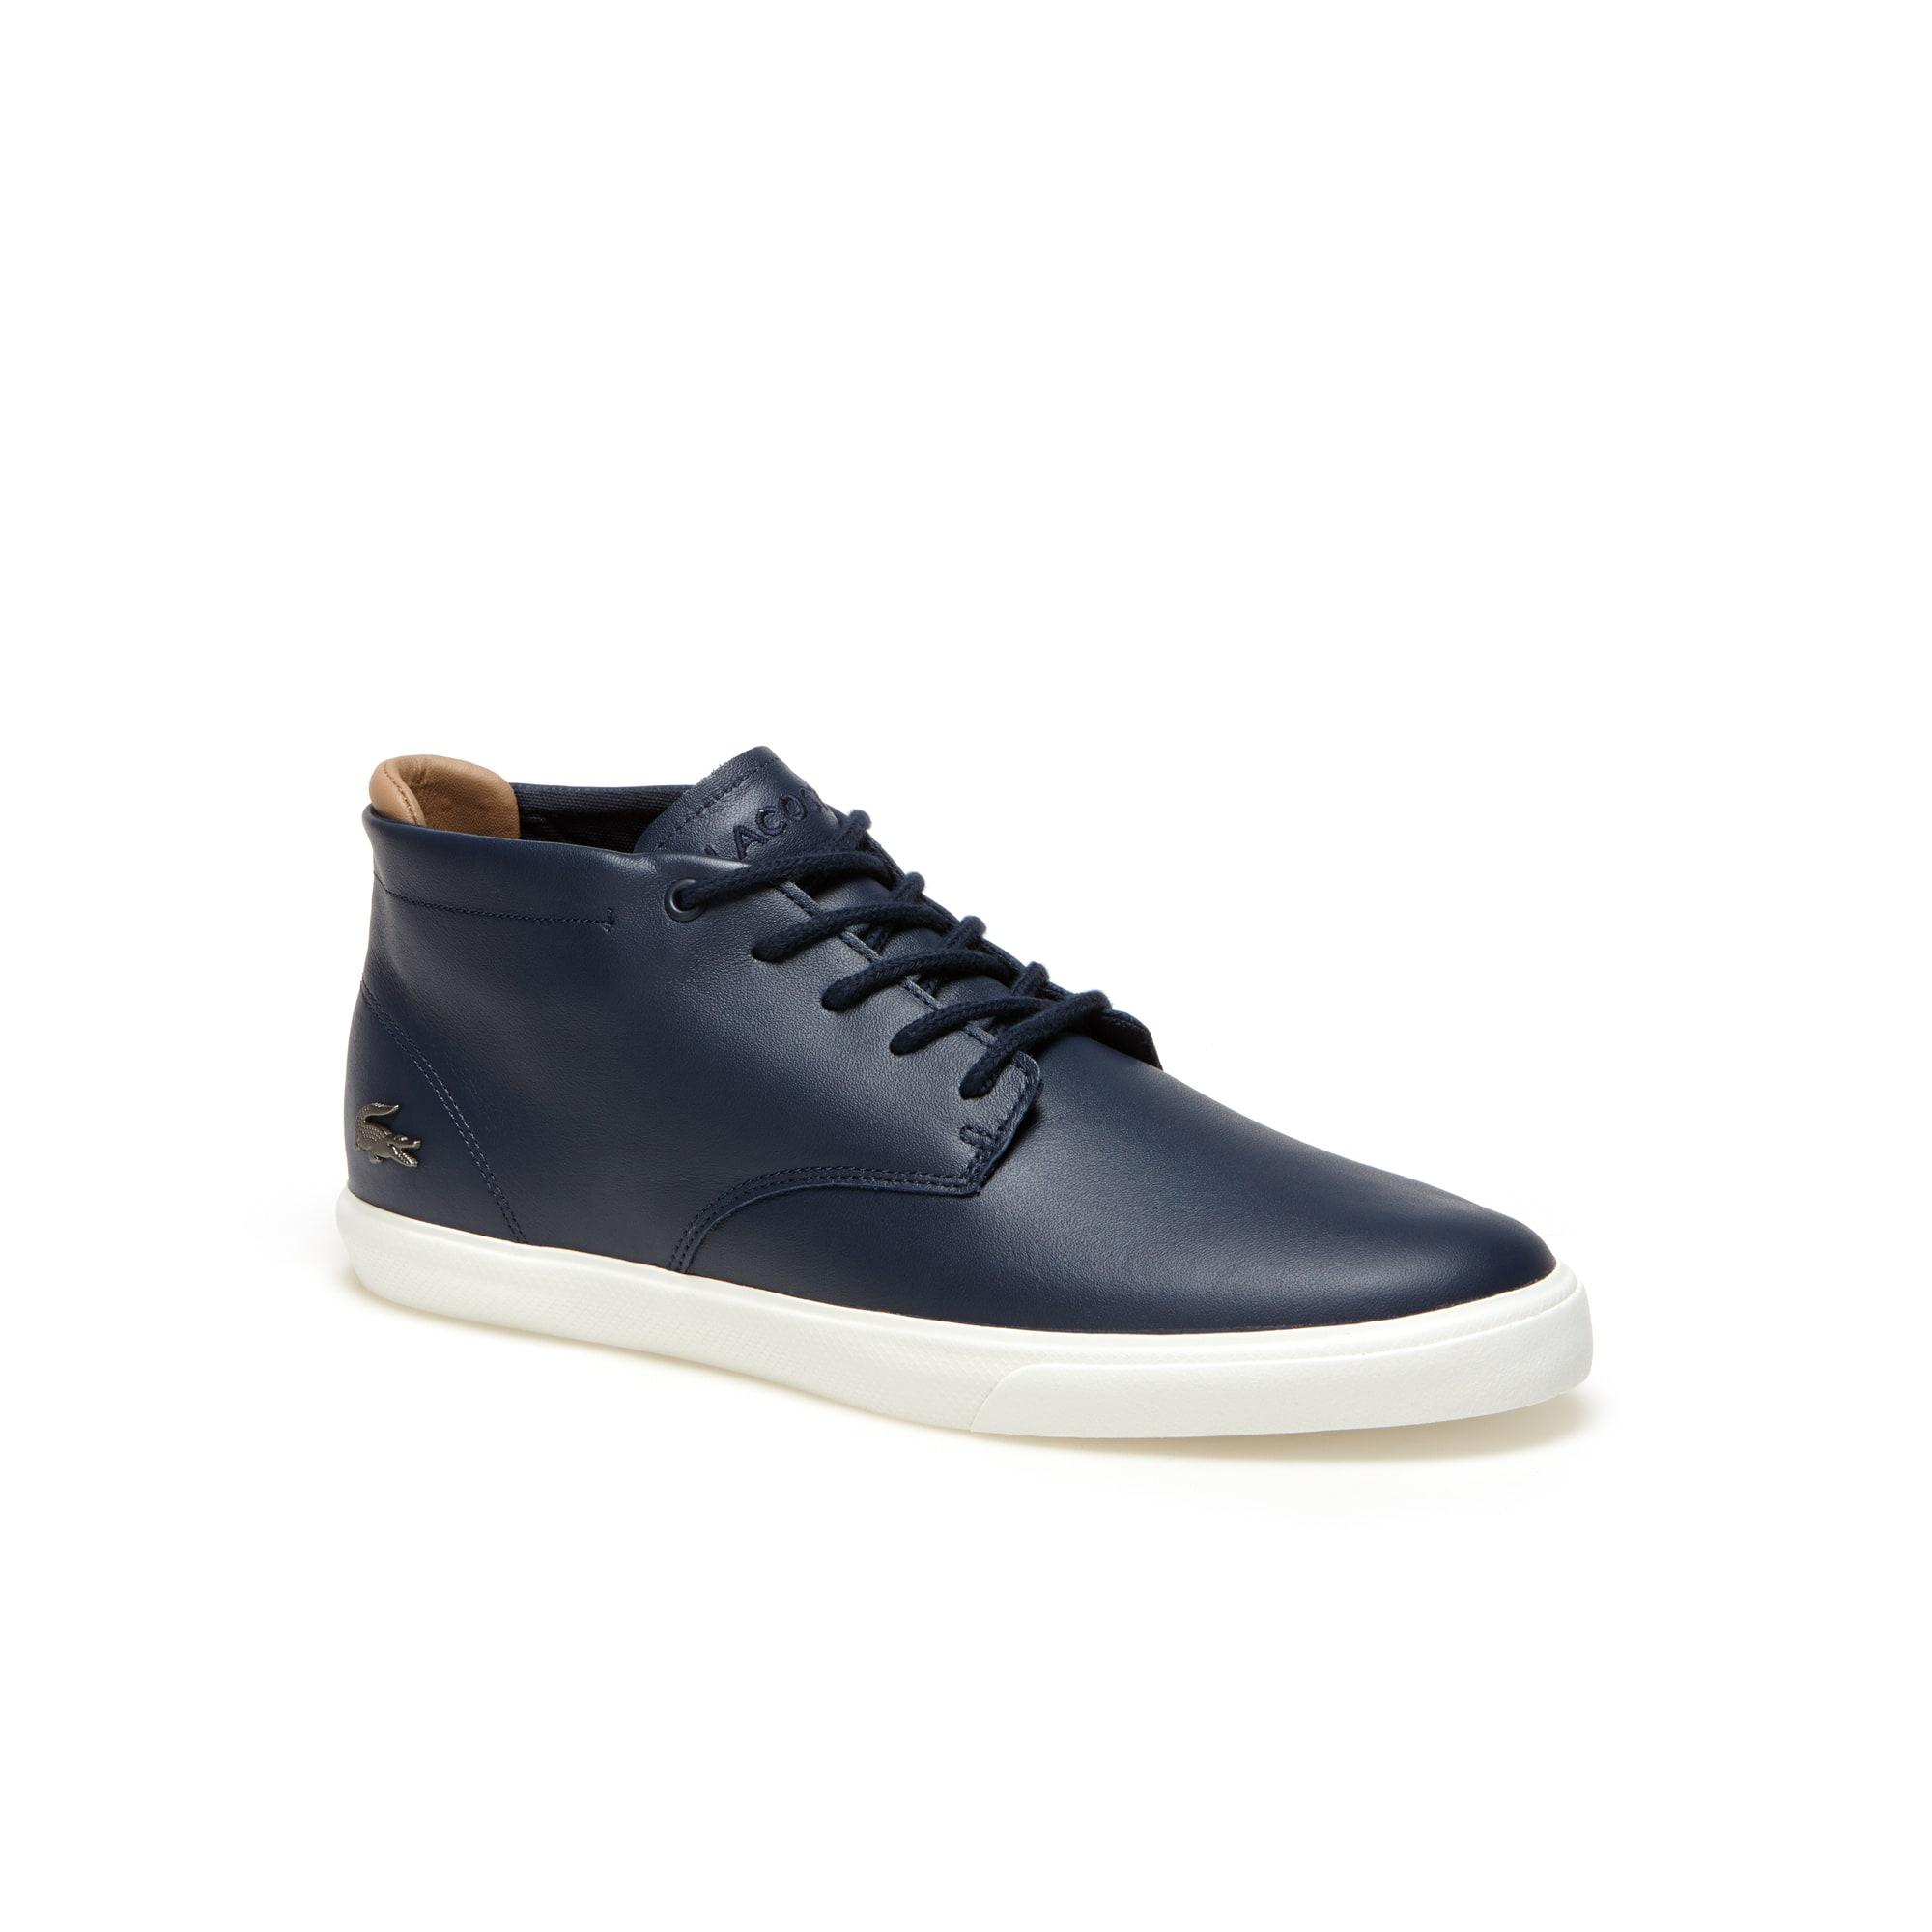 Herren-Sneakers ESPERE CHUKKA aus Leder